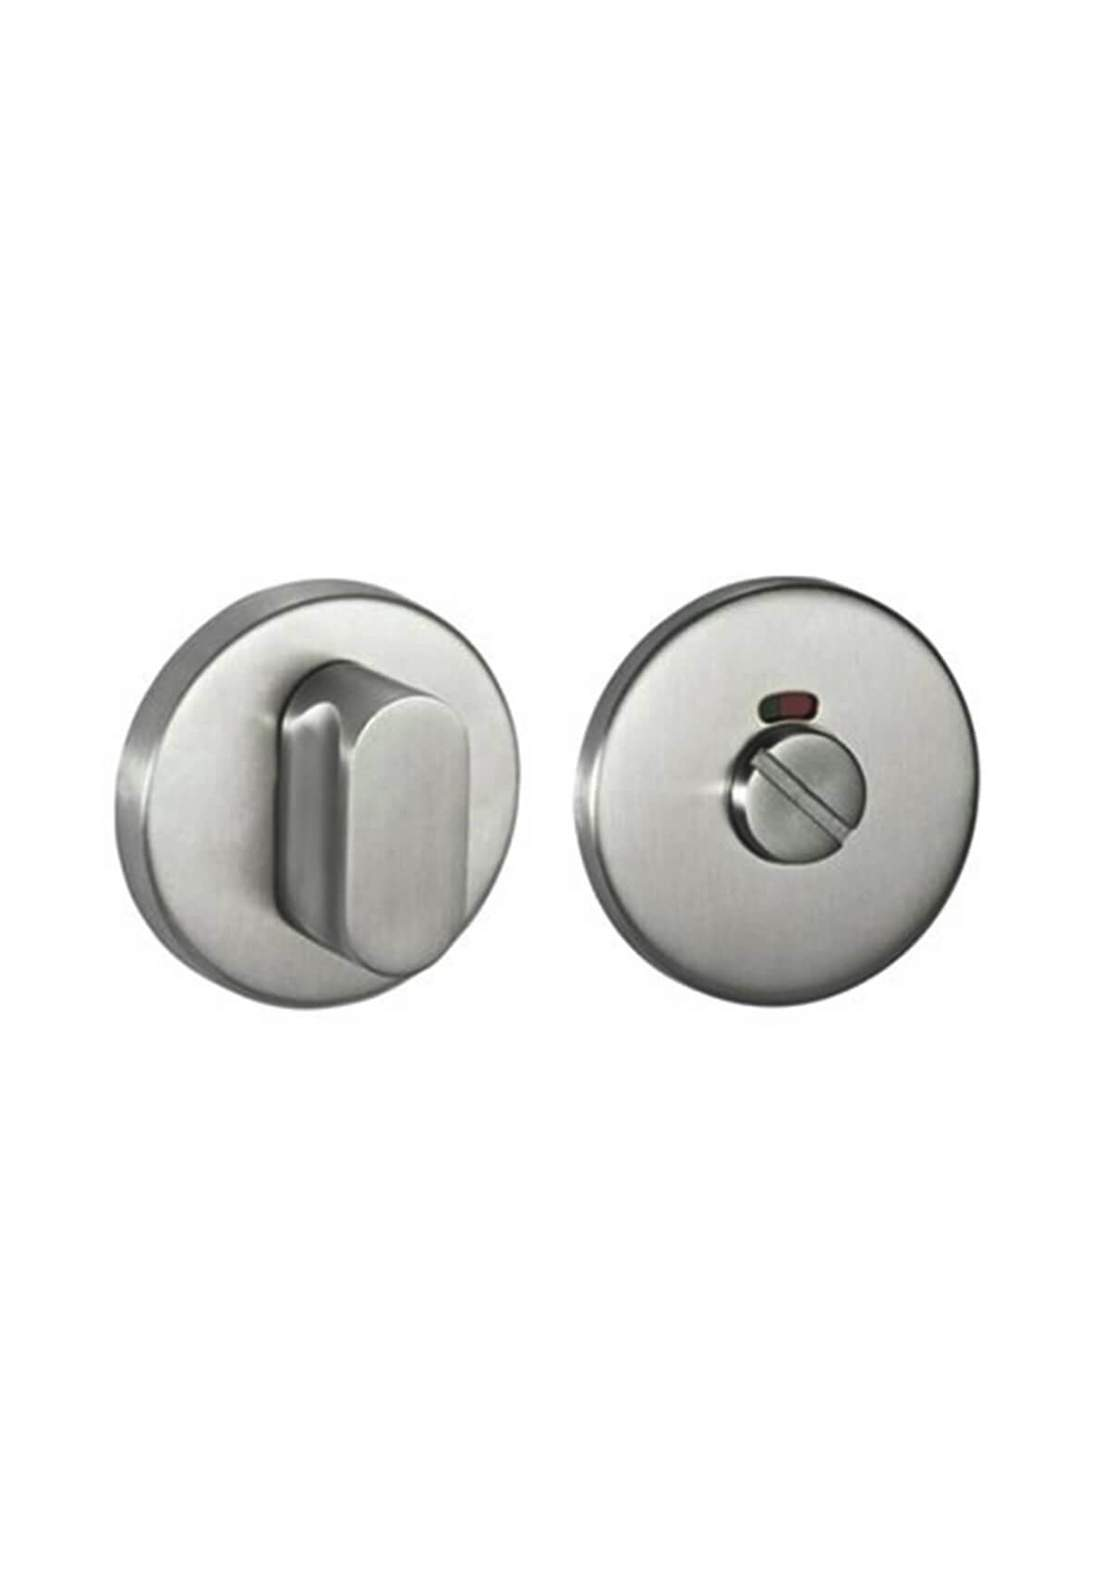 Yale 35-9004-4001-00-31-50 Bathroom Door Lock Indicator  مؤشر قفل باب الحمام